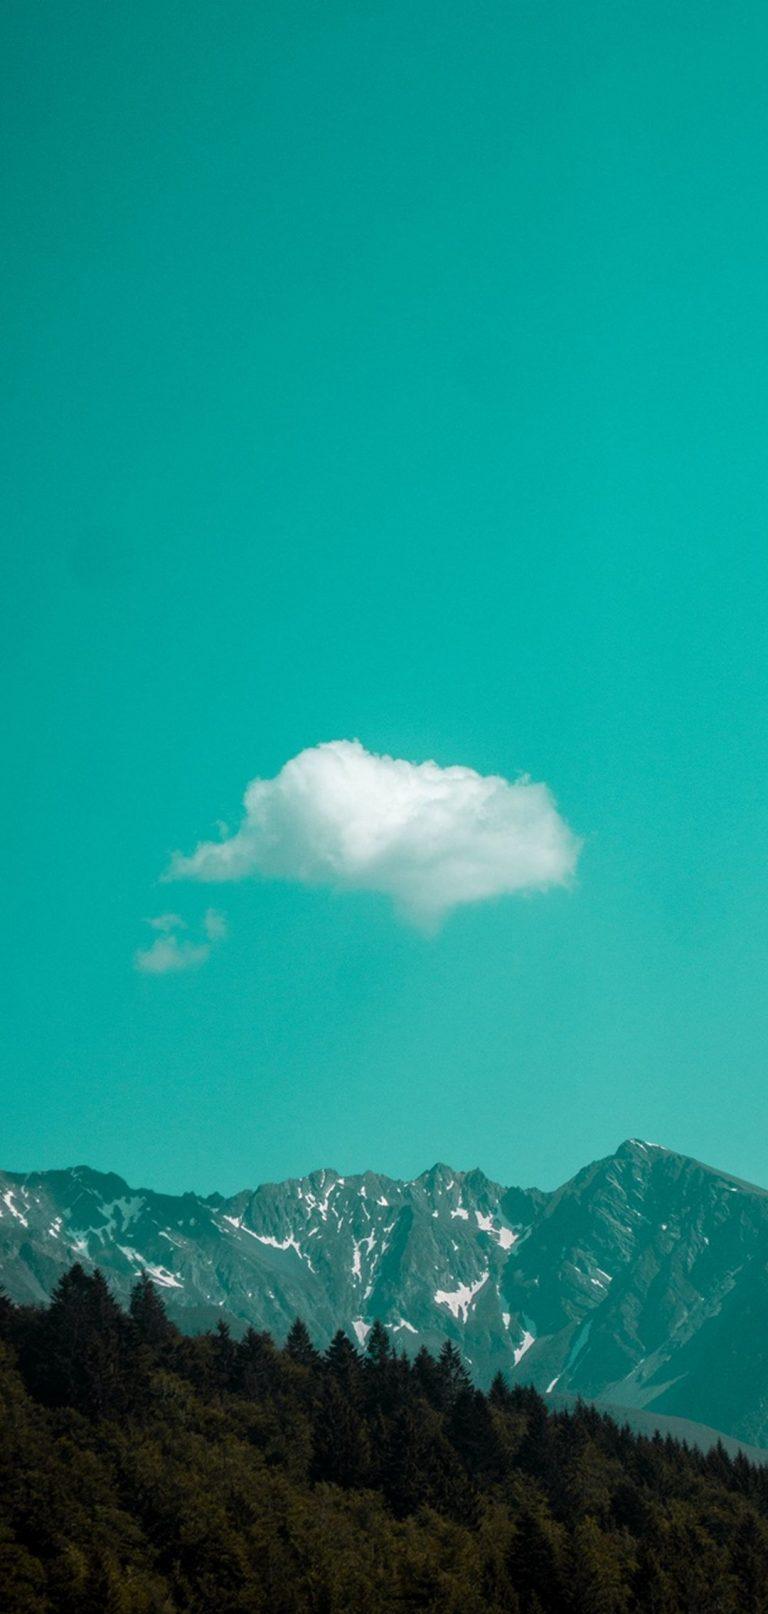 Mountains Clouds La Morte 1080x2270 768x1614